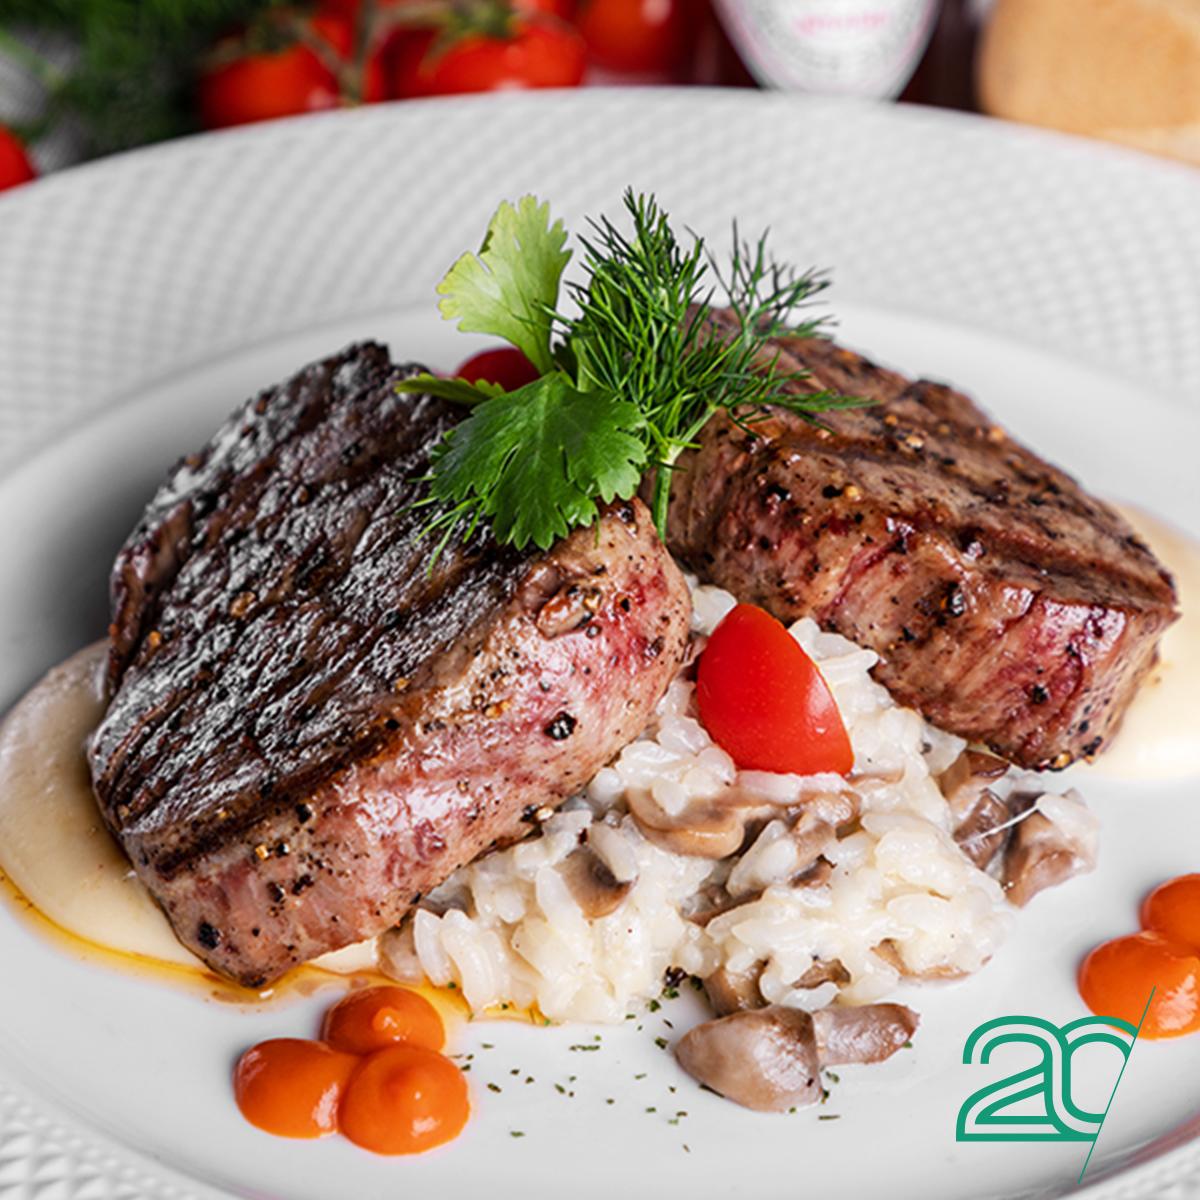 Meat Steak Dish